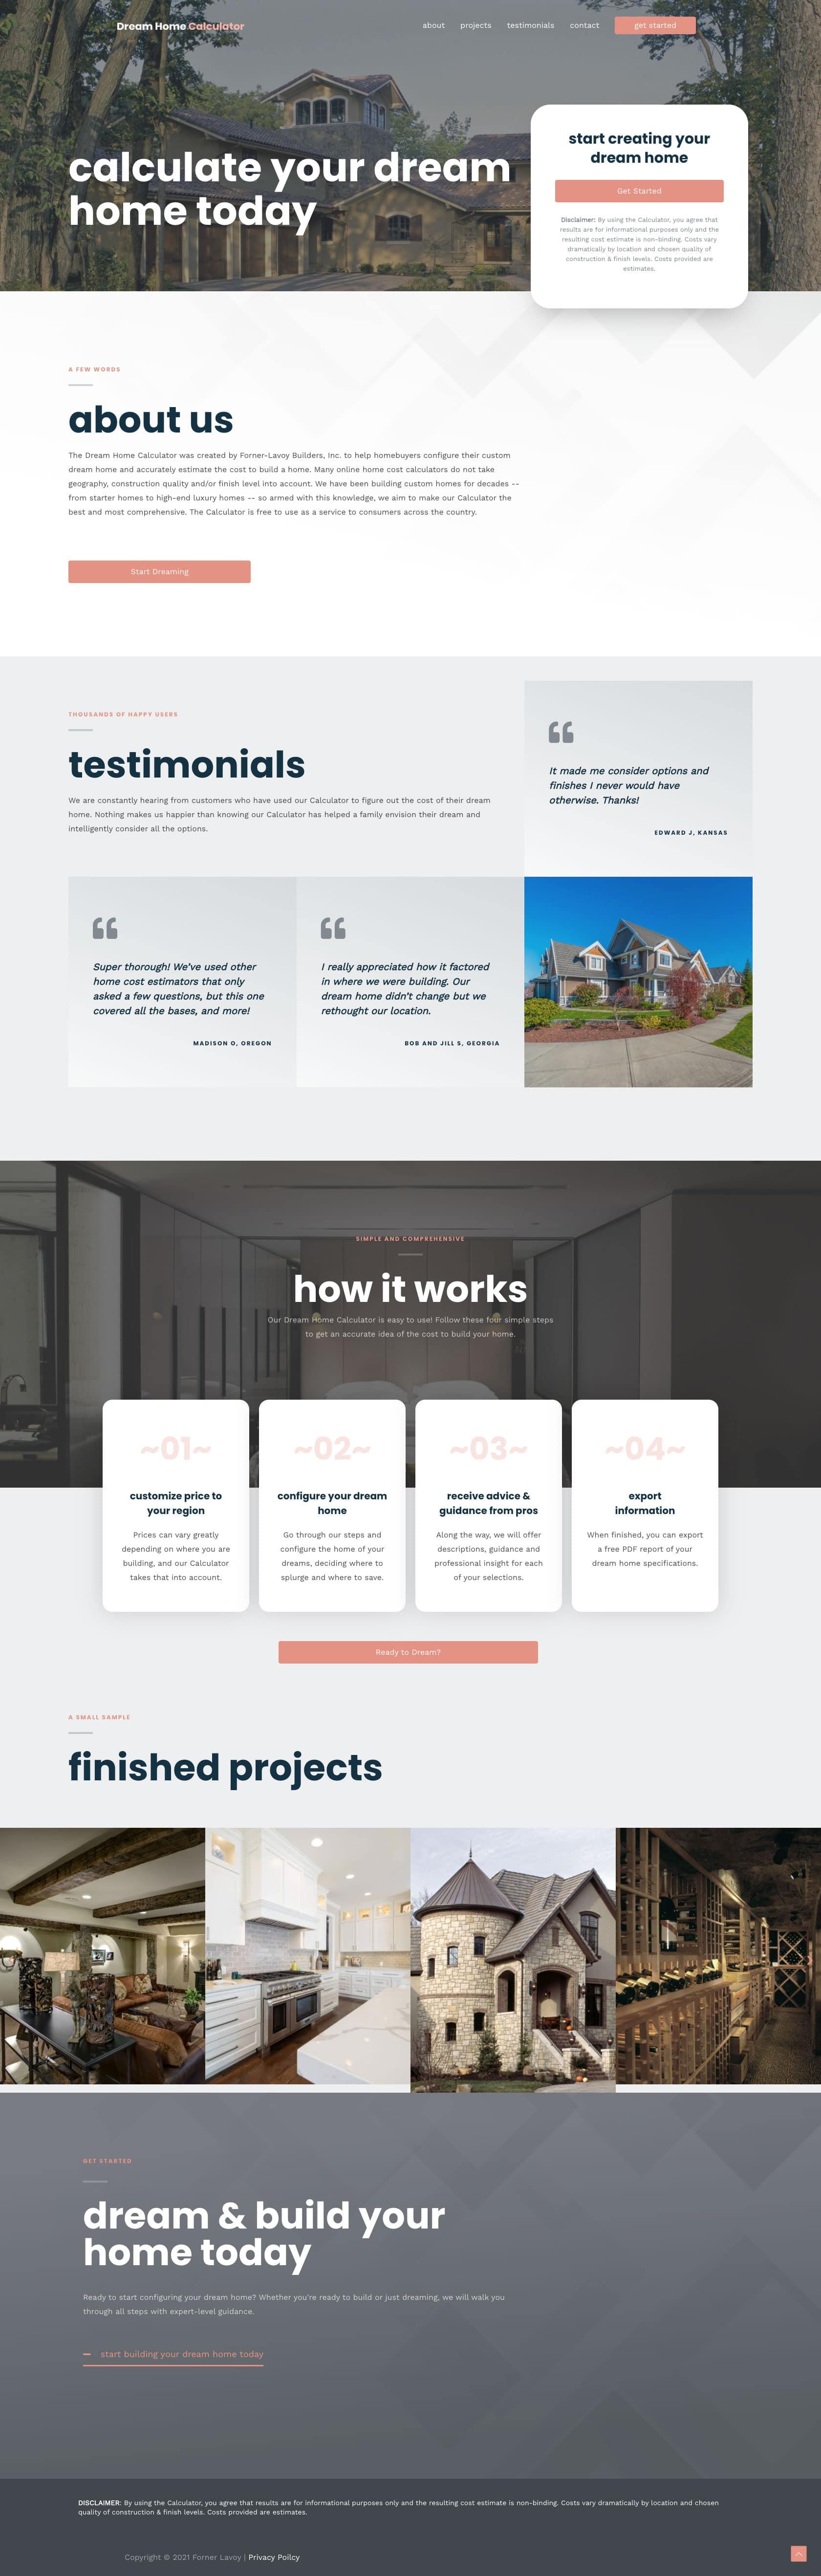 Dream Home Calculator Full Page